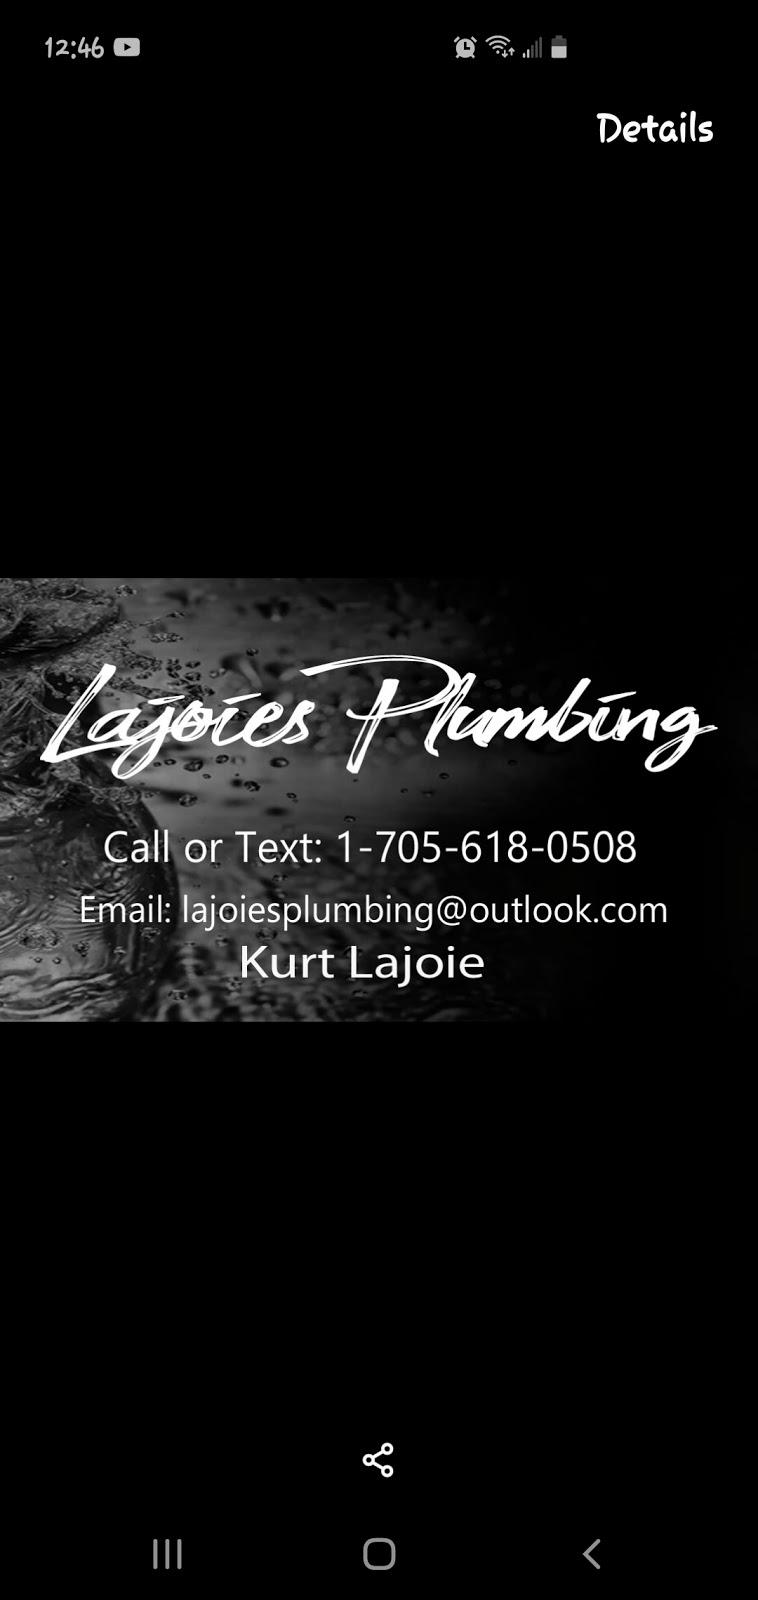 Lajoies Plumbing   plumber   455 Otterbein Rd, Kitchener, ON N2B 3V8, Canada   5197212698 OR +1 519-721-2698